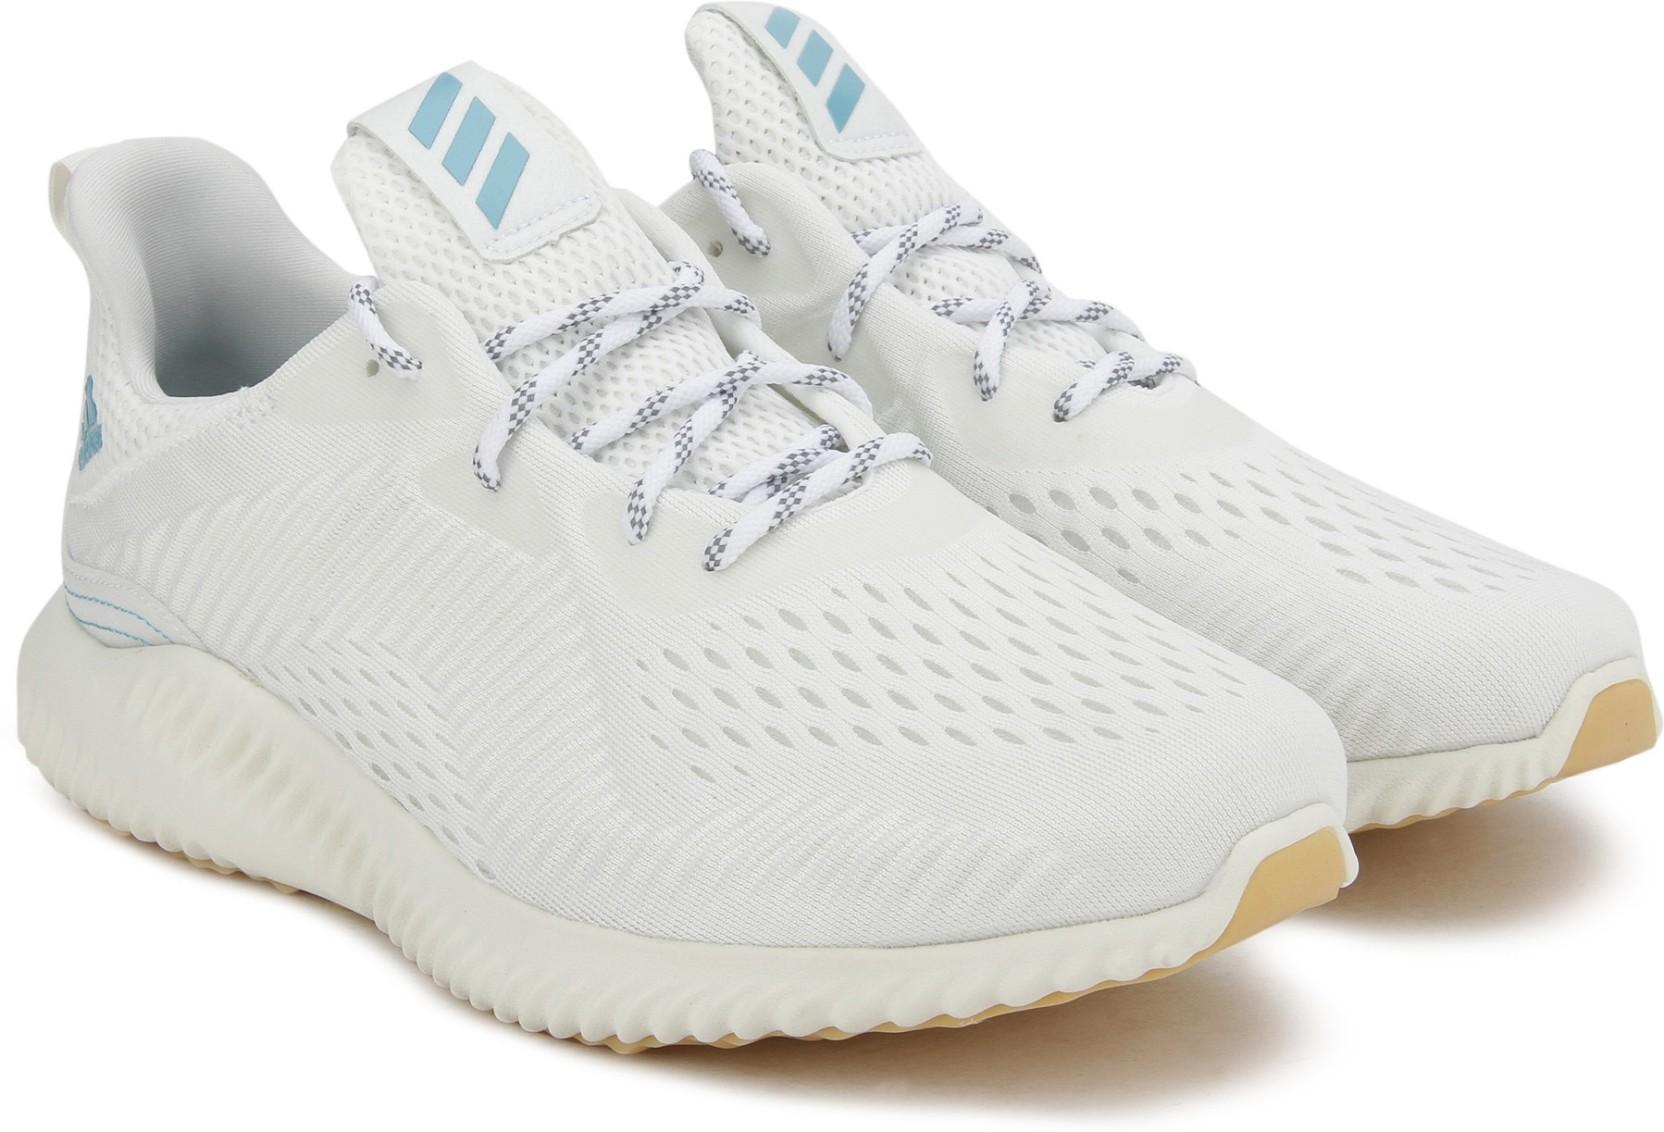 2a9e07c80d6 ADIDAS ALPHABOUNCE 1 PARLEY M Running Shoes For Men - Buy NONDYE ...